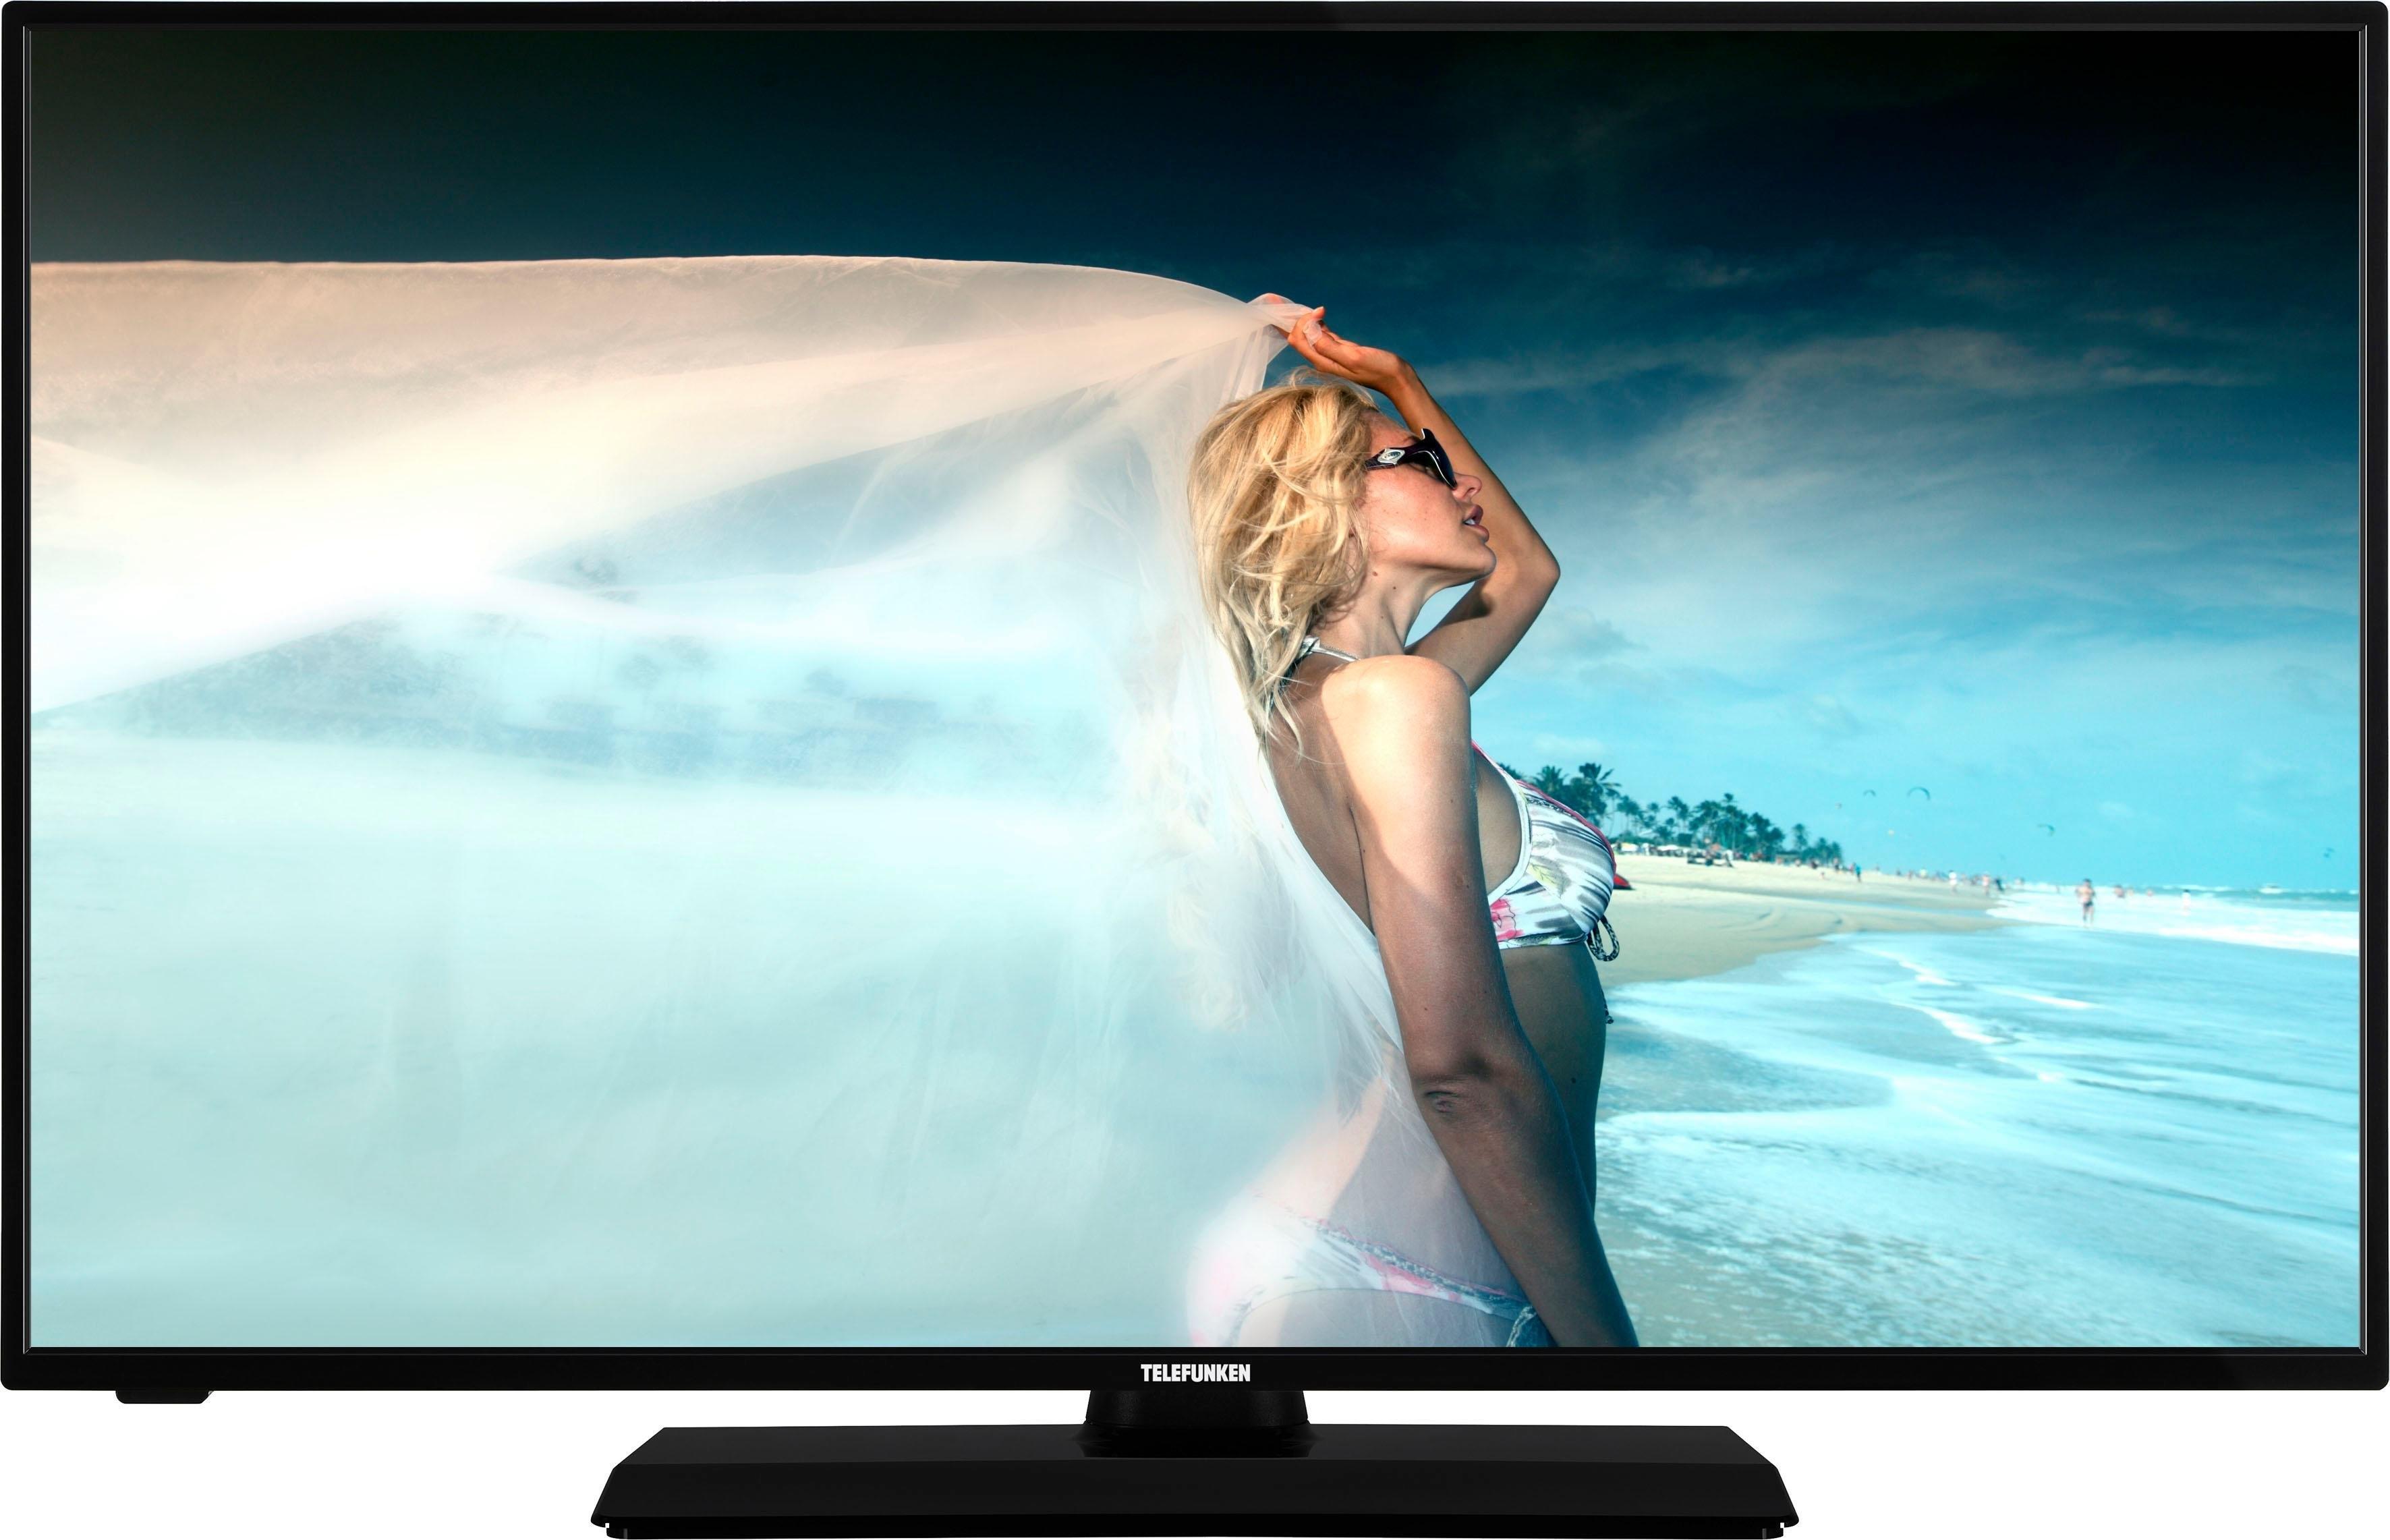 Telefunken D43F500M4CW led-tv (108 cm / 43 inch), Full HD, smart-tv - verschillende betaalmethodes